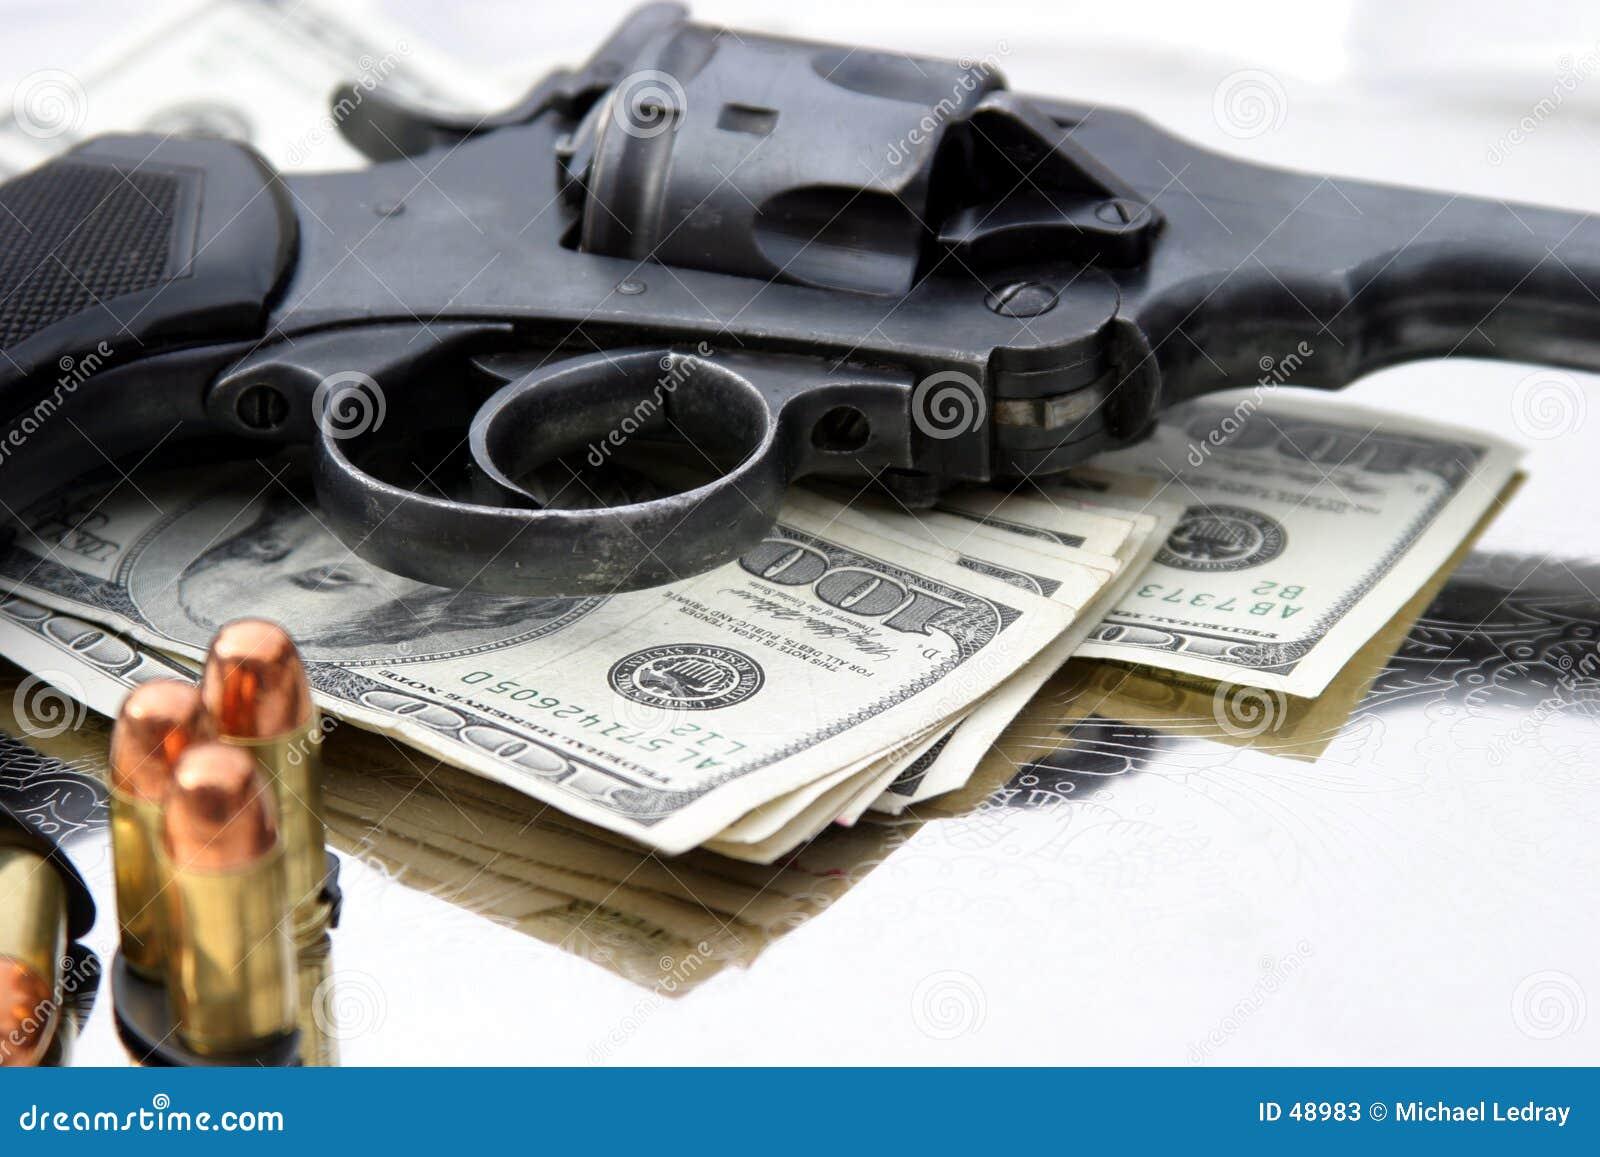 6 45 cal手枪